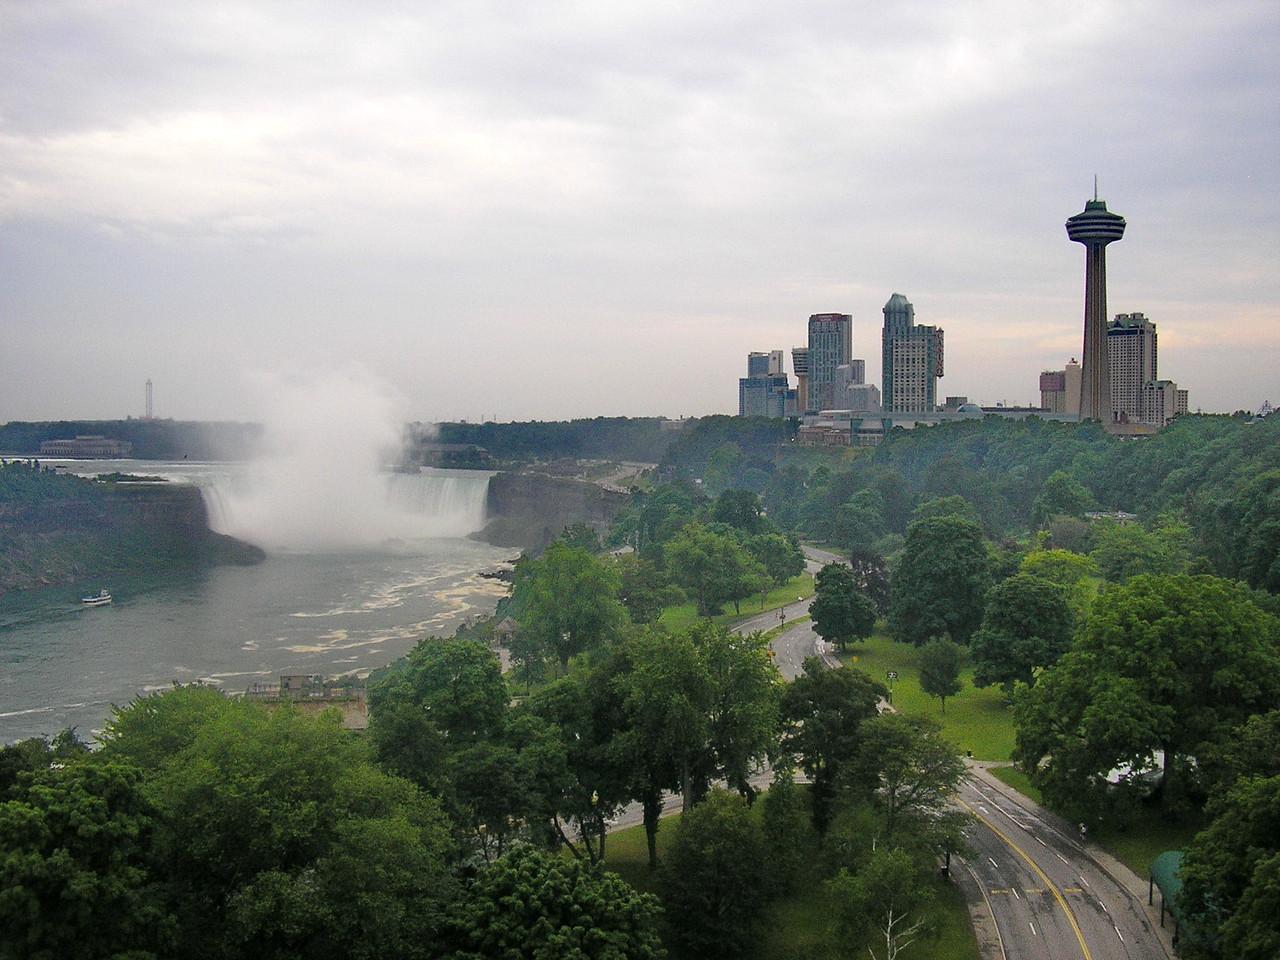 Horseshoe Falls and the City